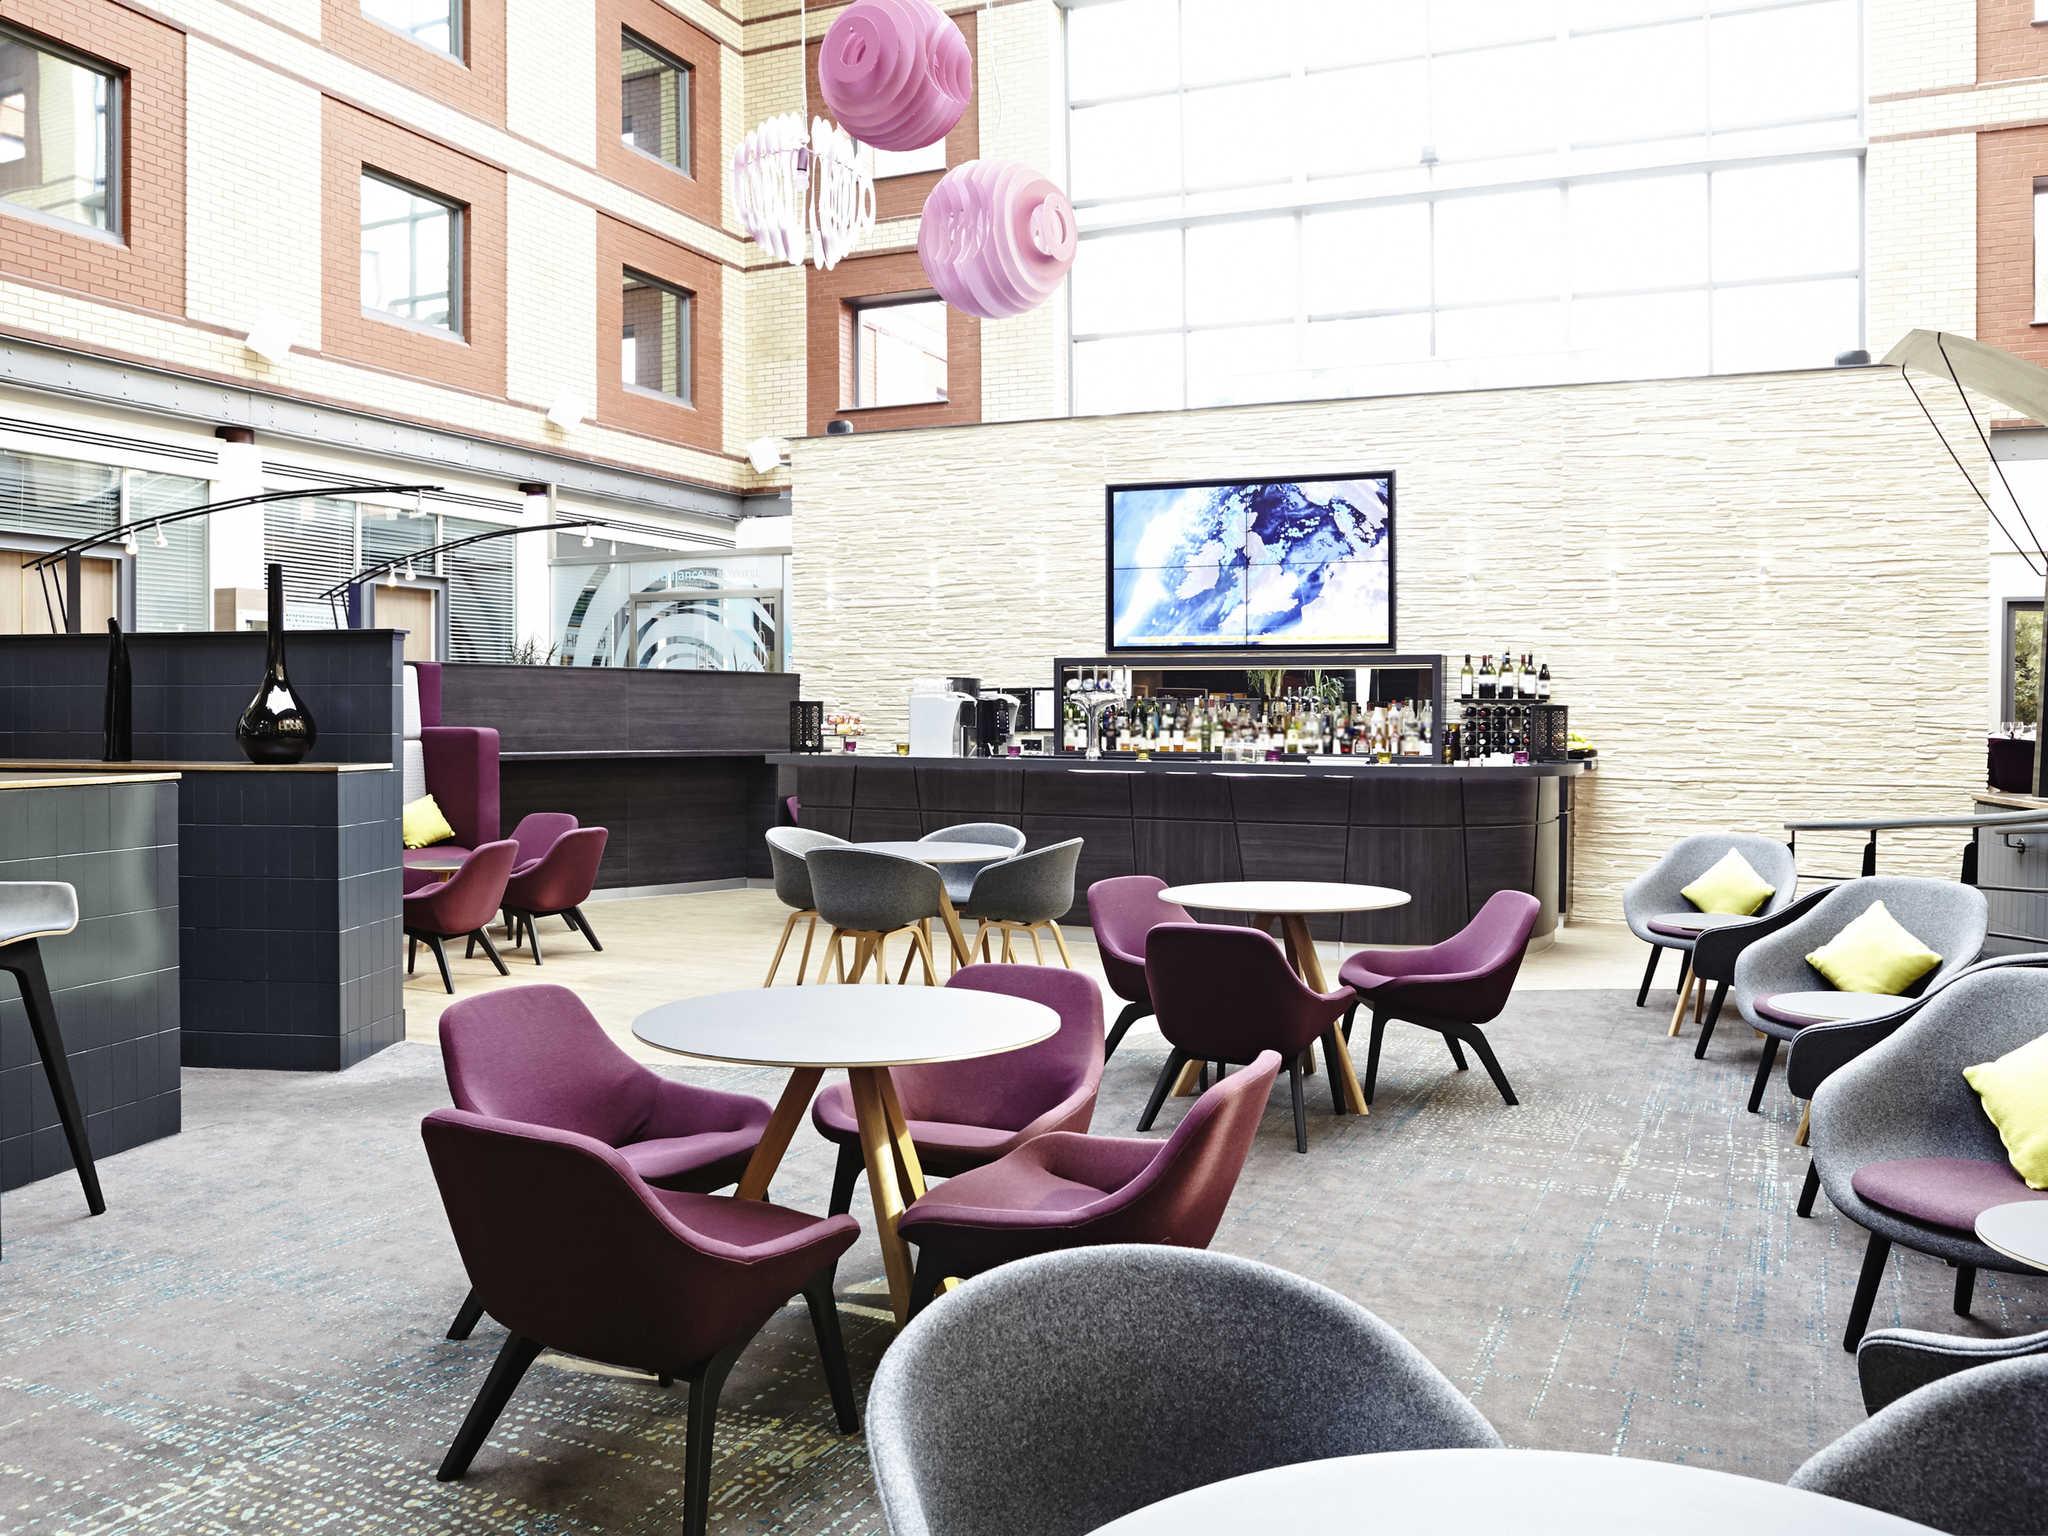 Hotel – Novotel London Heathrow Airport - M4 Jct 4